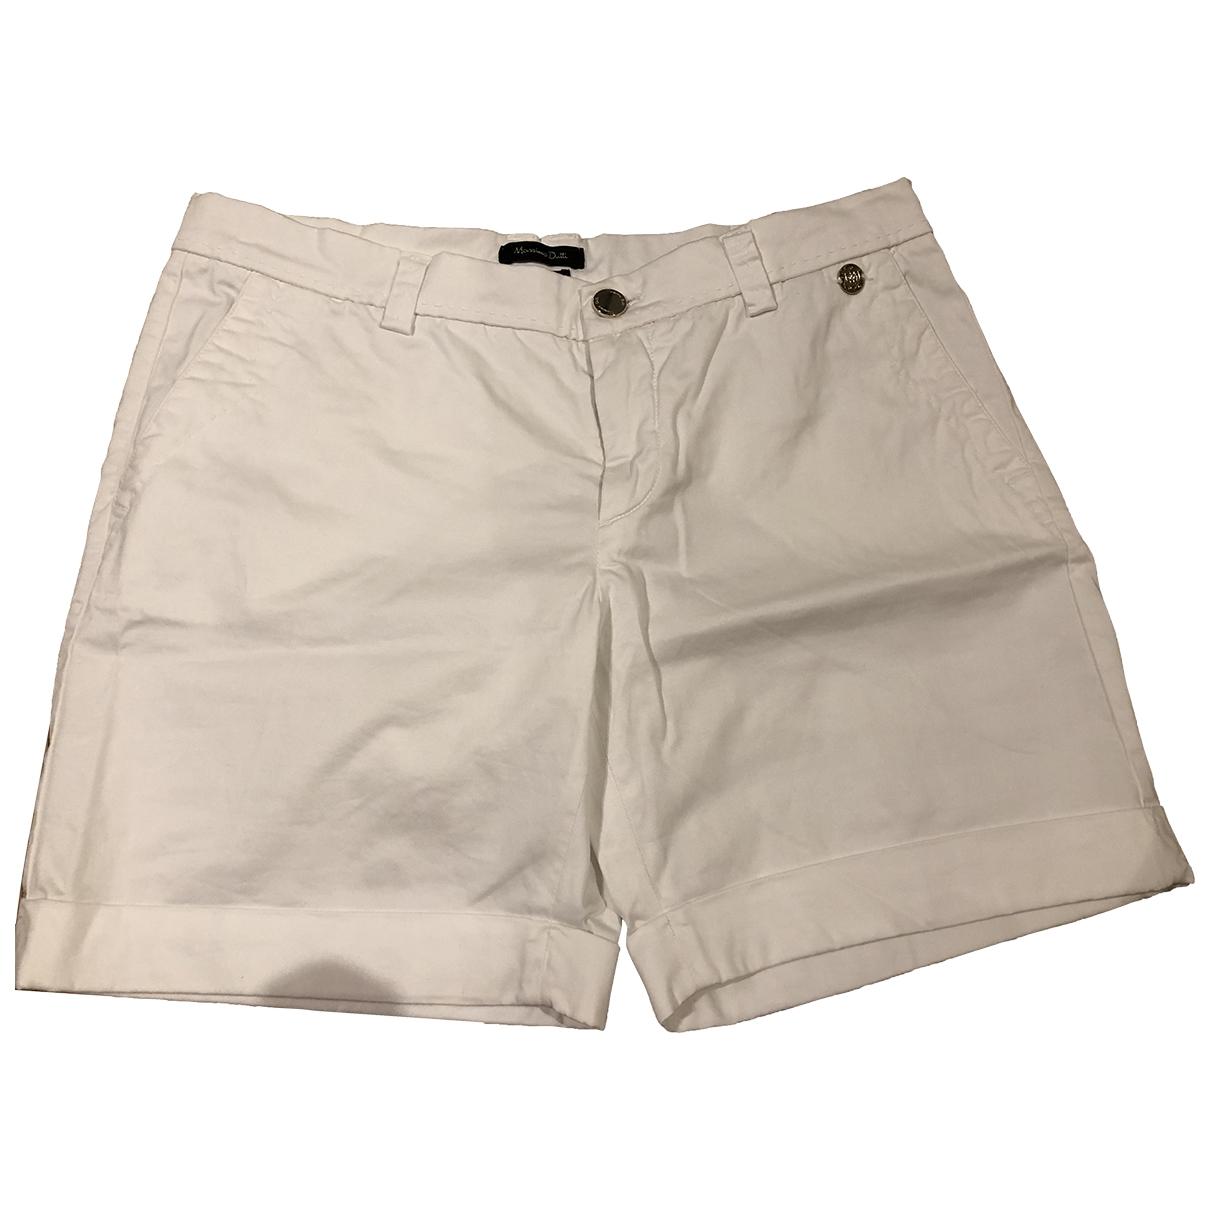 Massimo Dutti \N Shorts in  Weiss Baumwolle - Elasthan